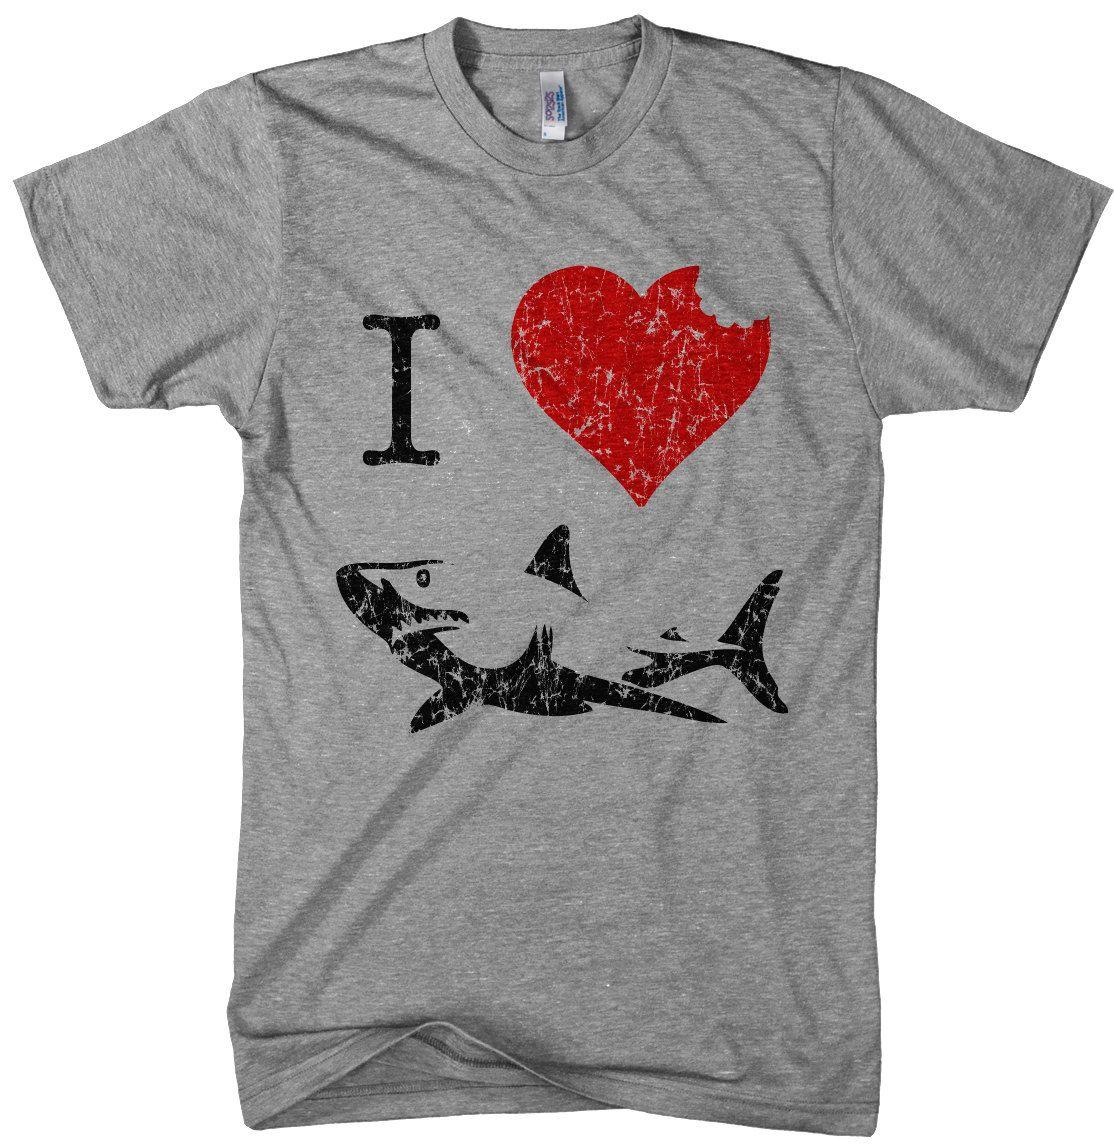 b4669464 I Love Sharks t shirt funny shark bite shirt by CrazyDogTshirts, $18.99